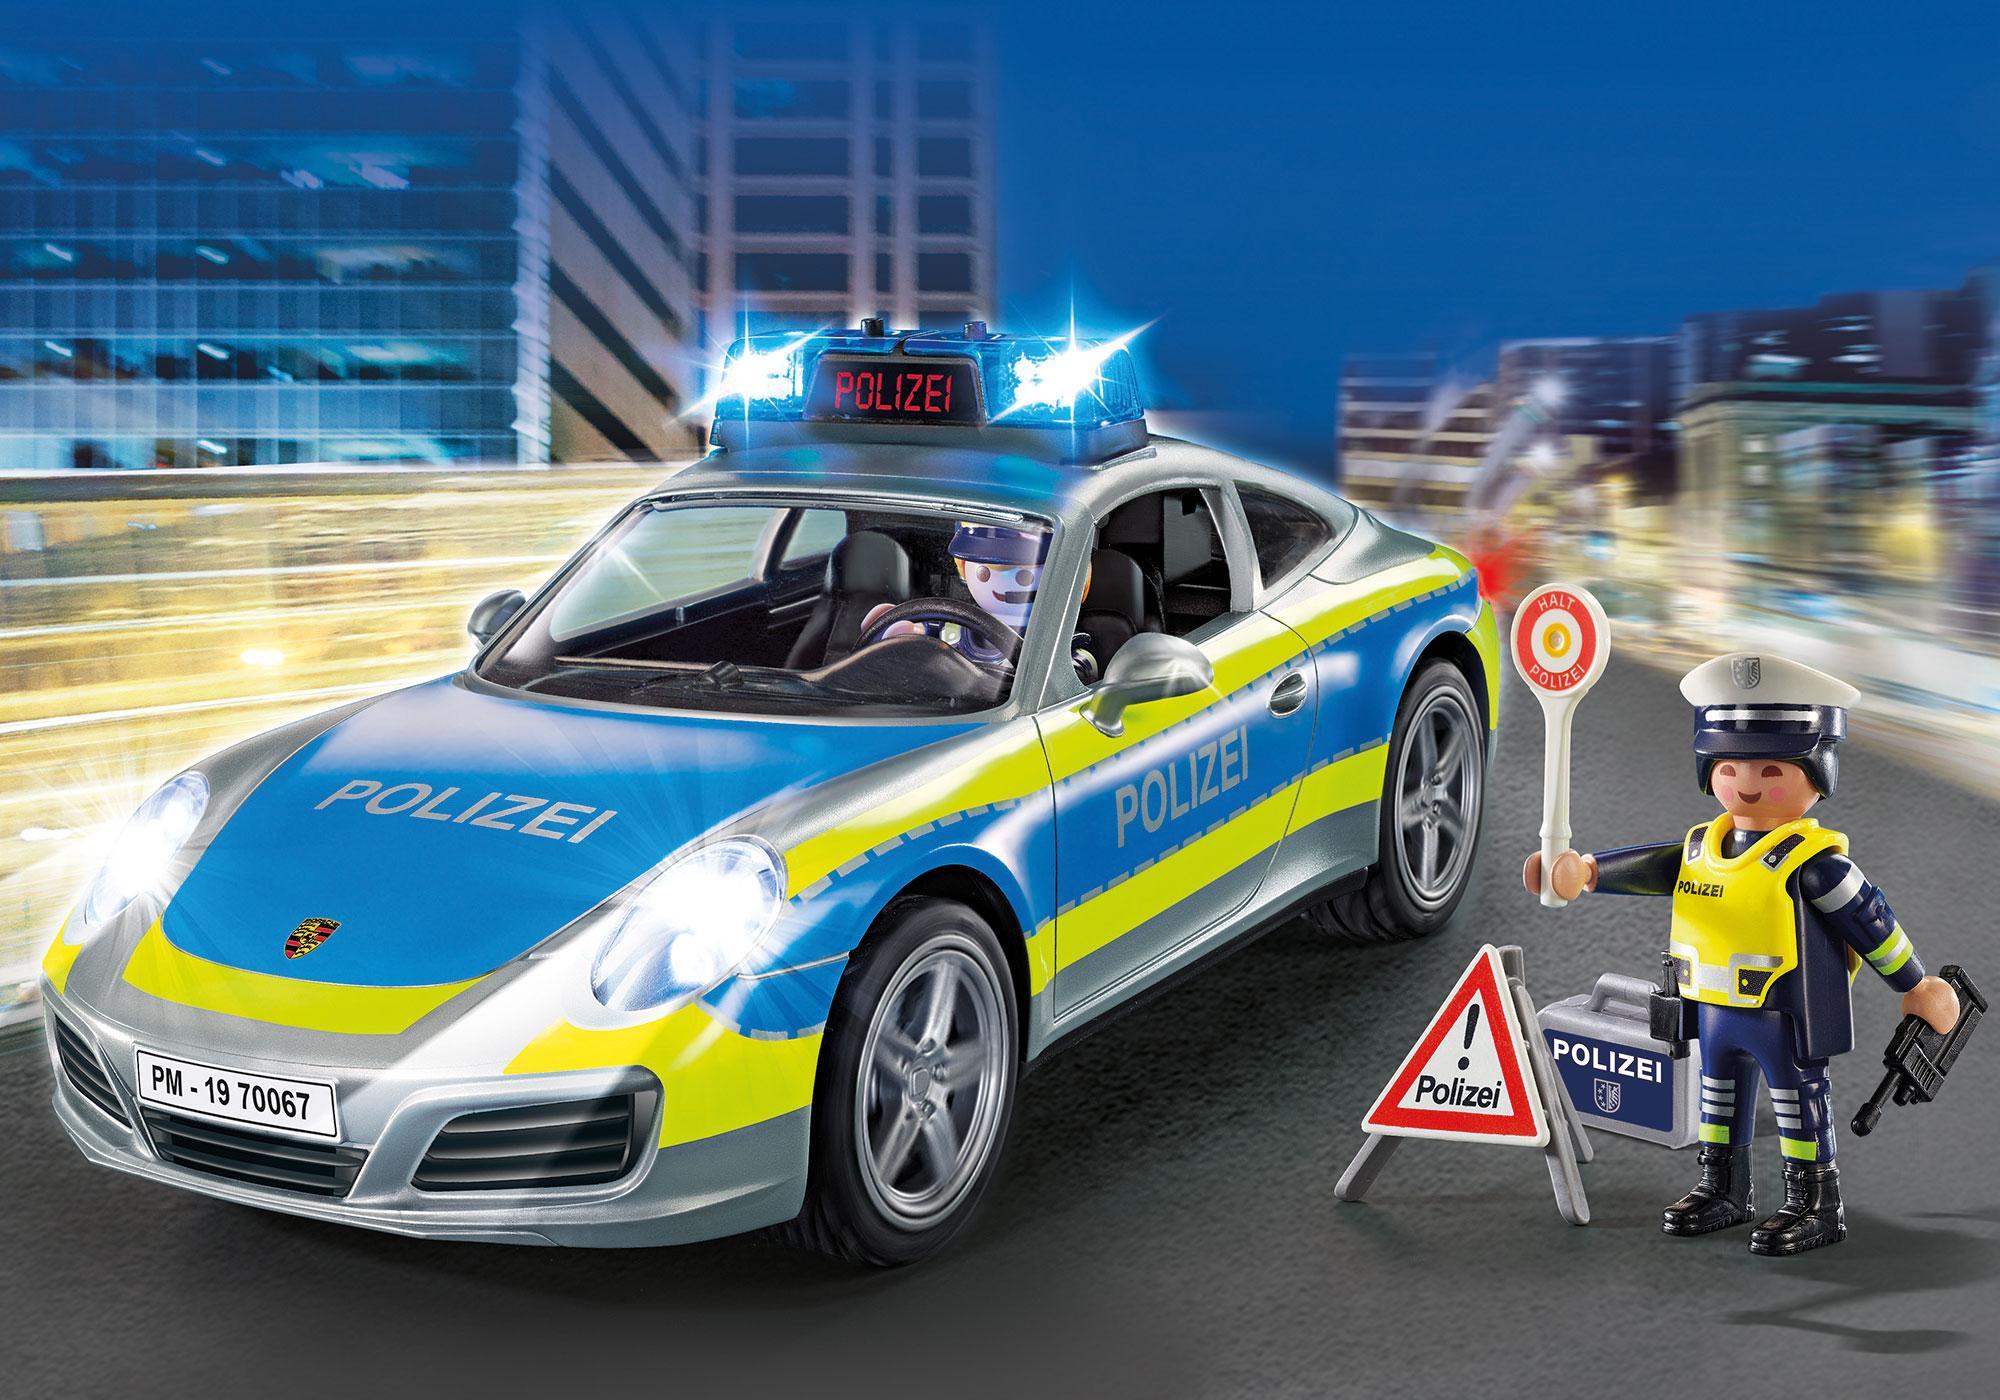 70067_product_detail/Porsche 911 Carrera 4S Polizei